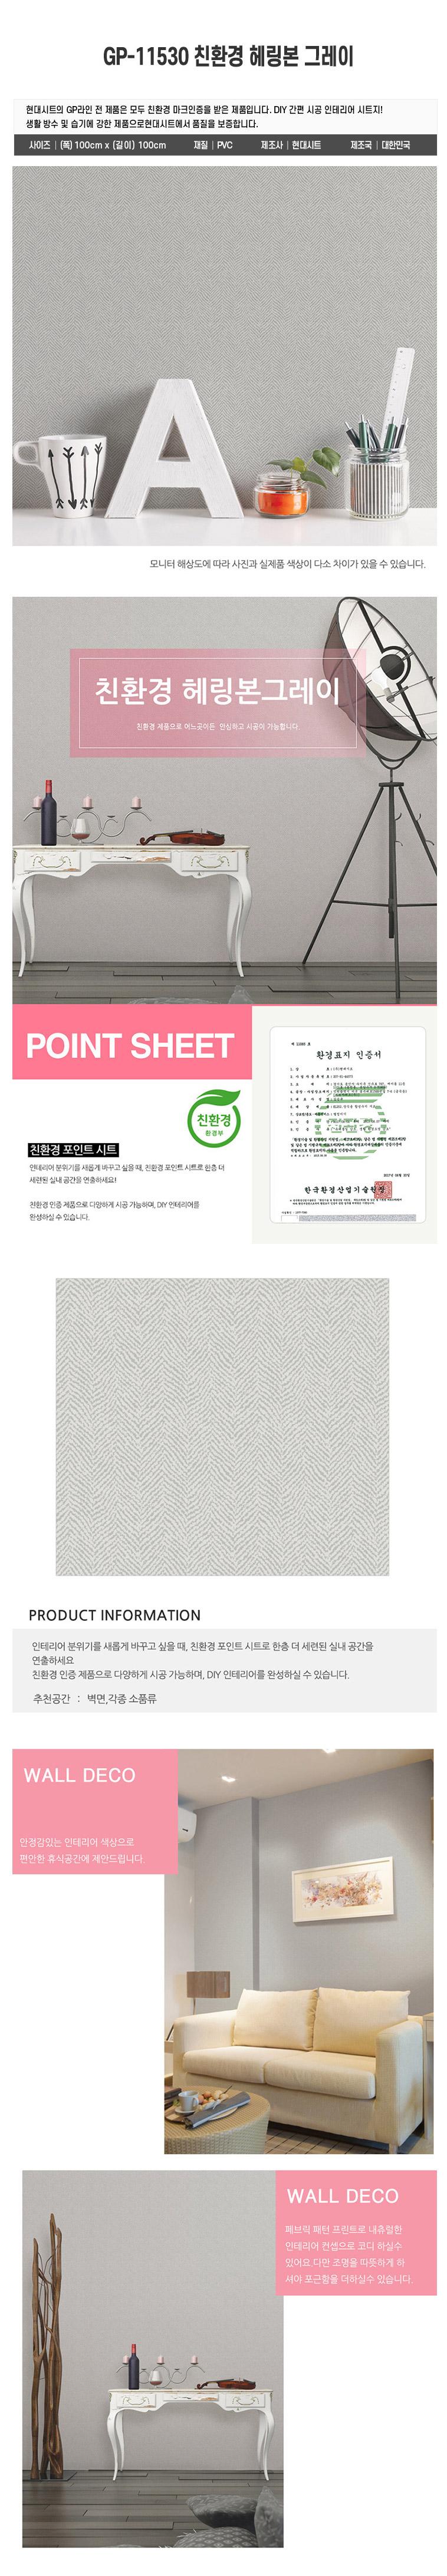 GP-11530 헤링본 그레이 - 케이알인터내셔날, 7,700원, 벽지/시트지, 단색벽지